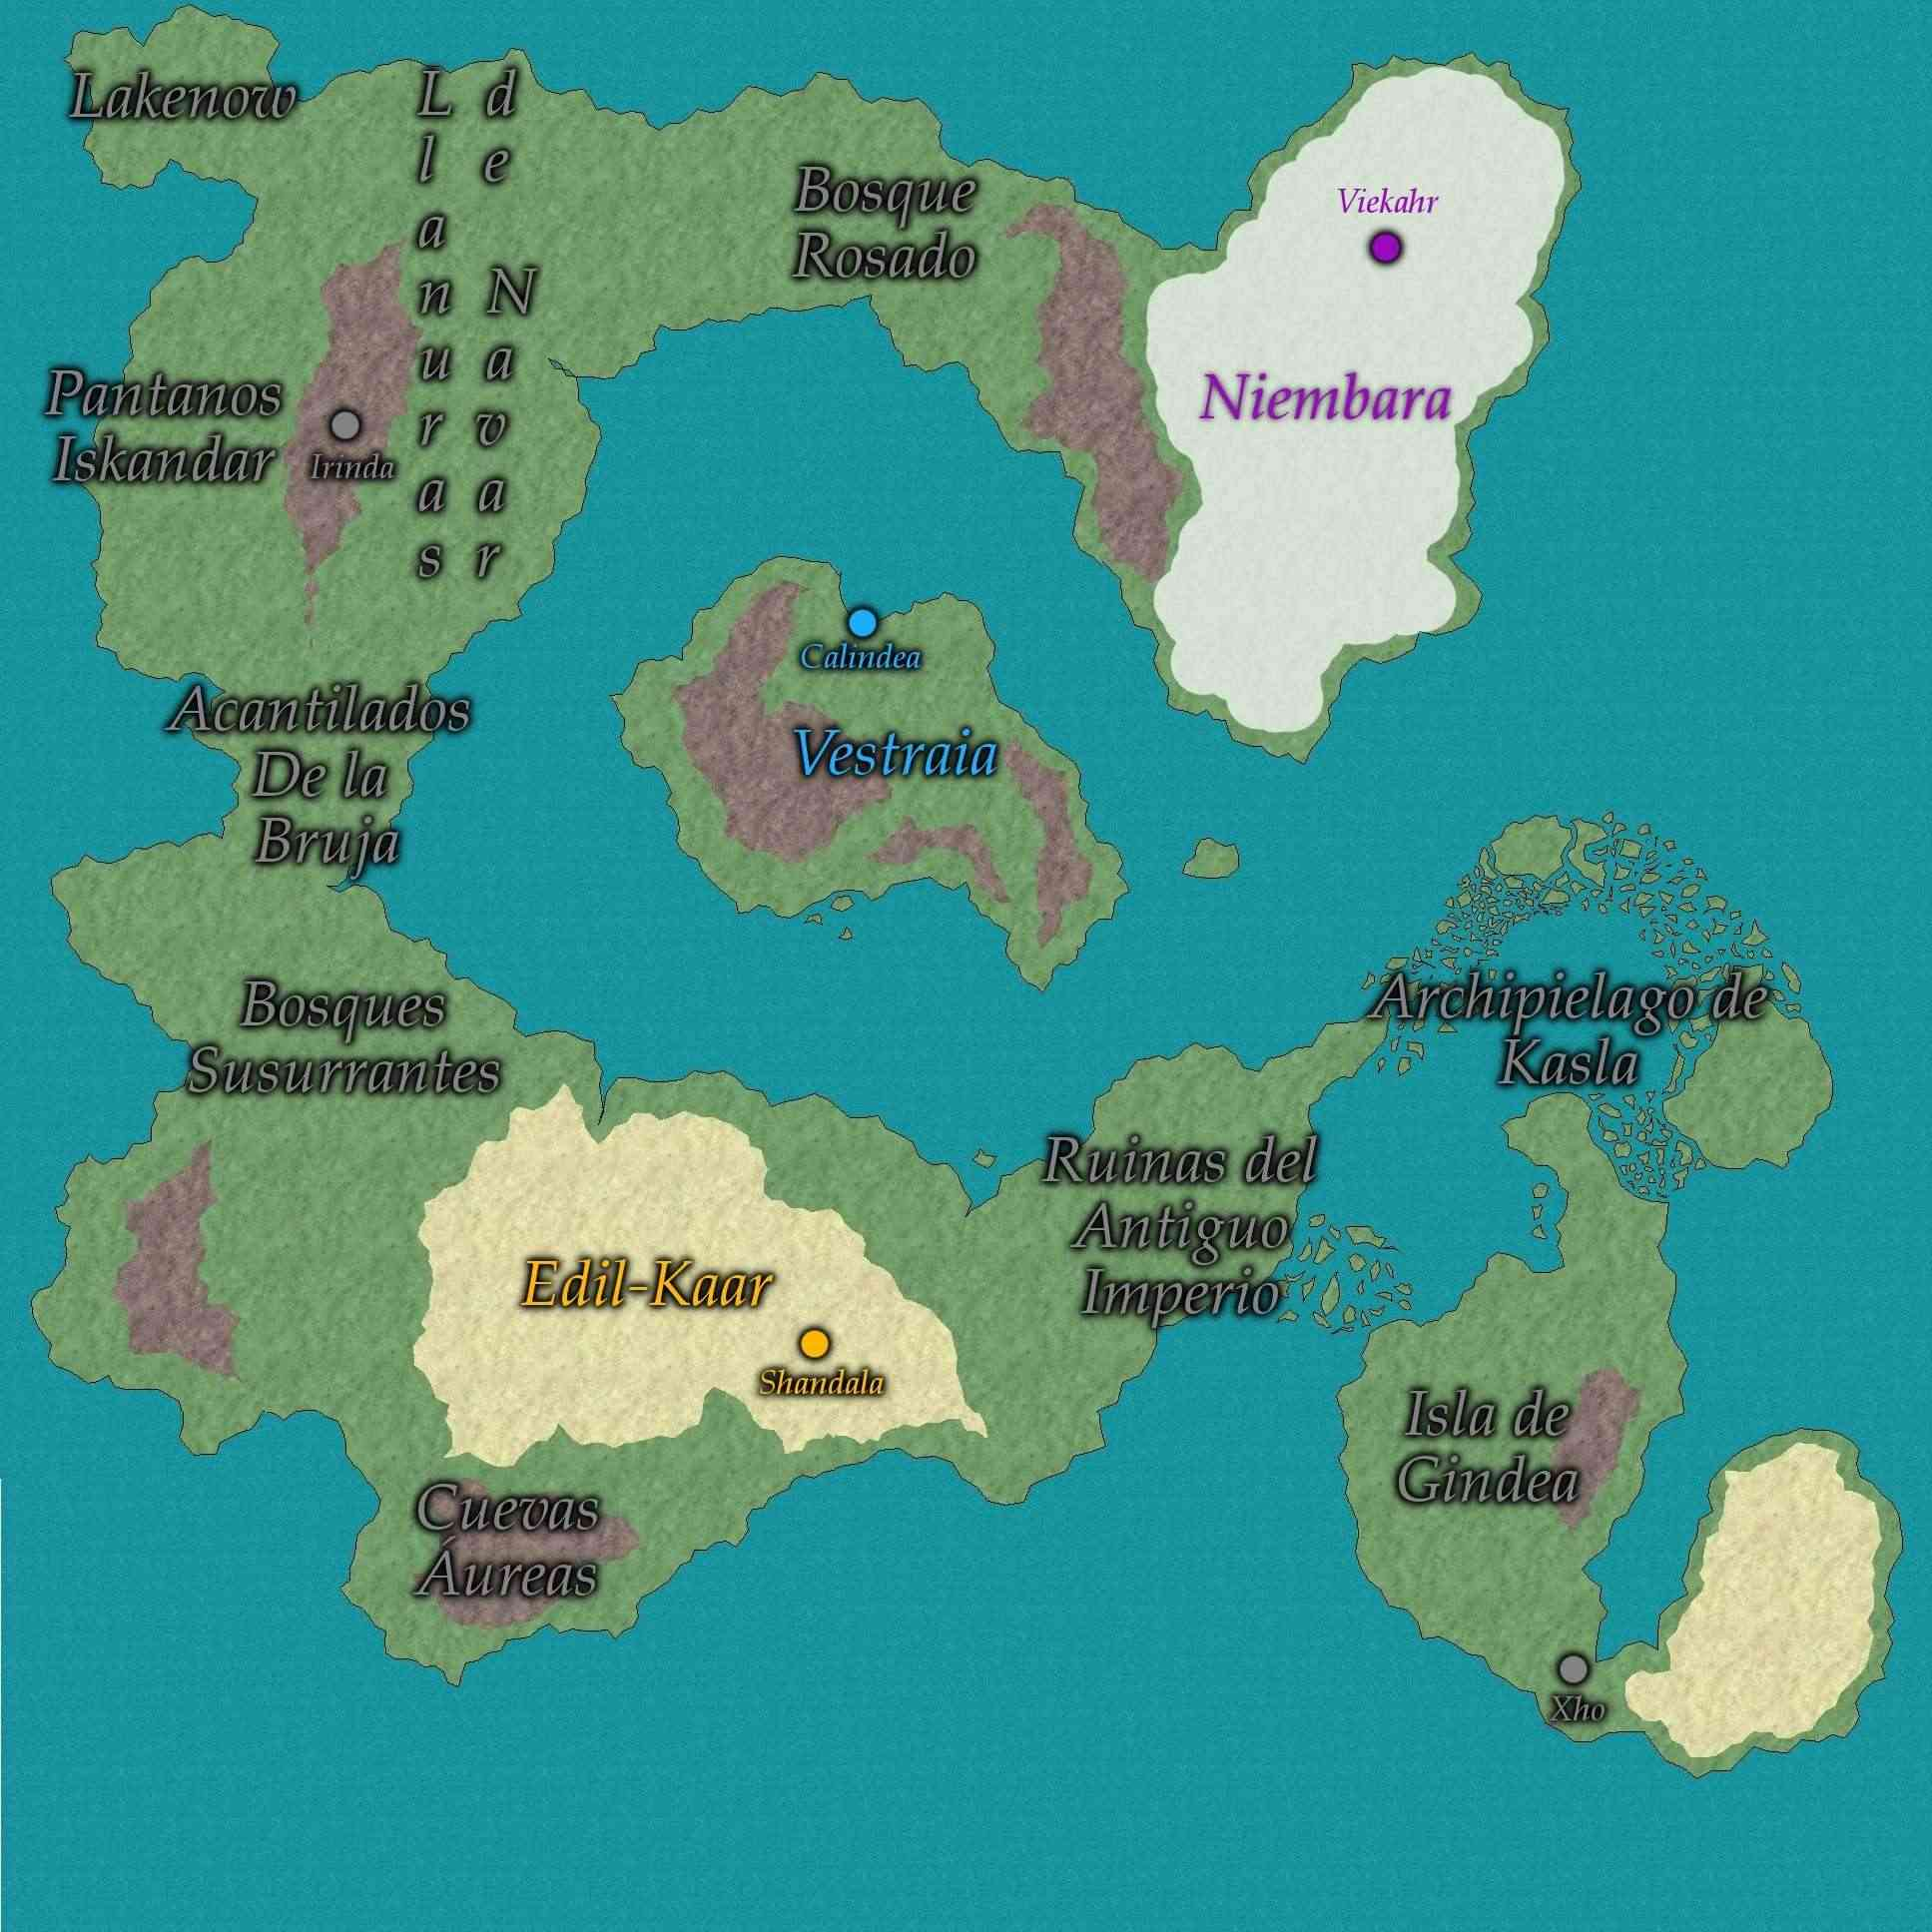 El Mapa Elmund10